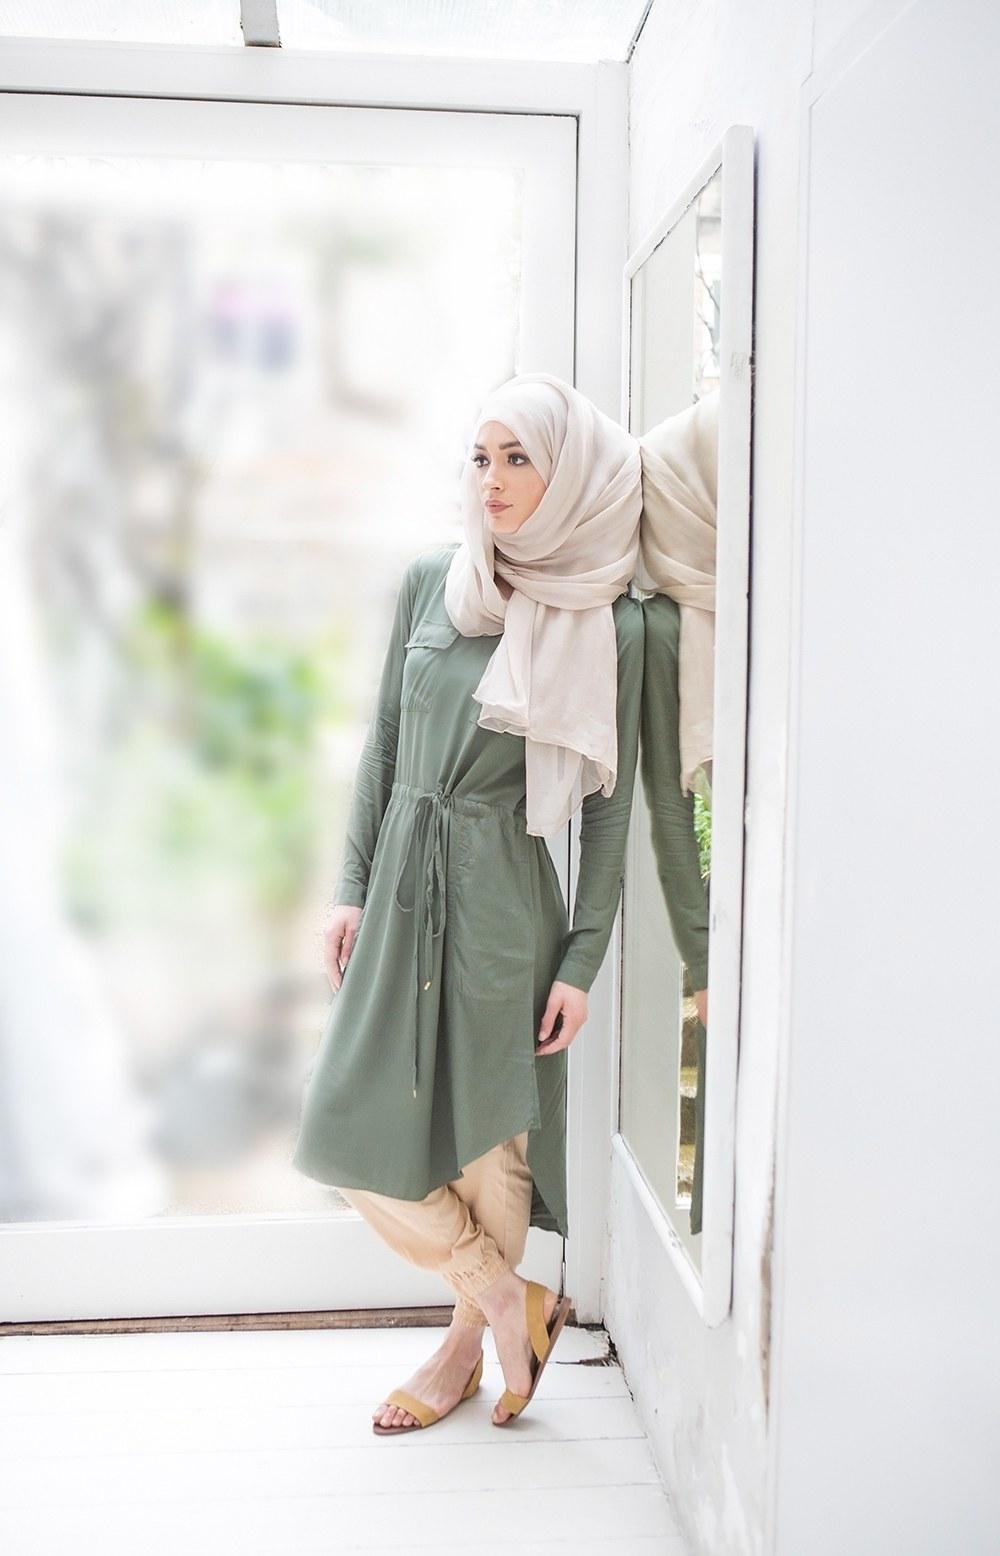 Model Trend Baju Lebaran Tahun Ini Ipdd 25 Trend Model Baju Muslim Lebaran 2018 Simple & Modis